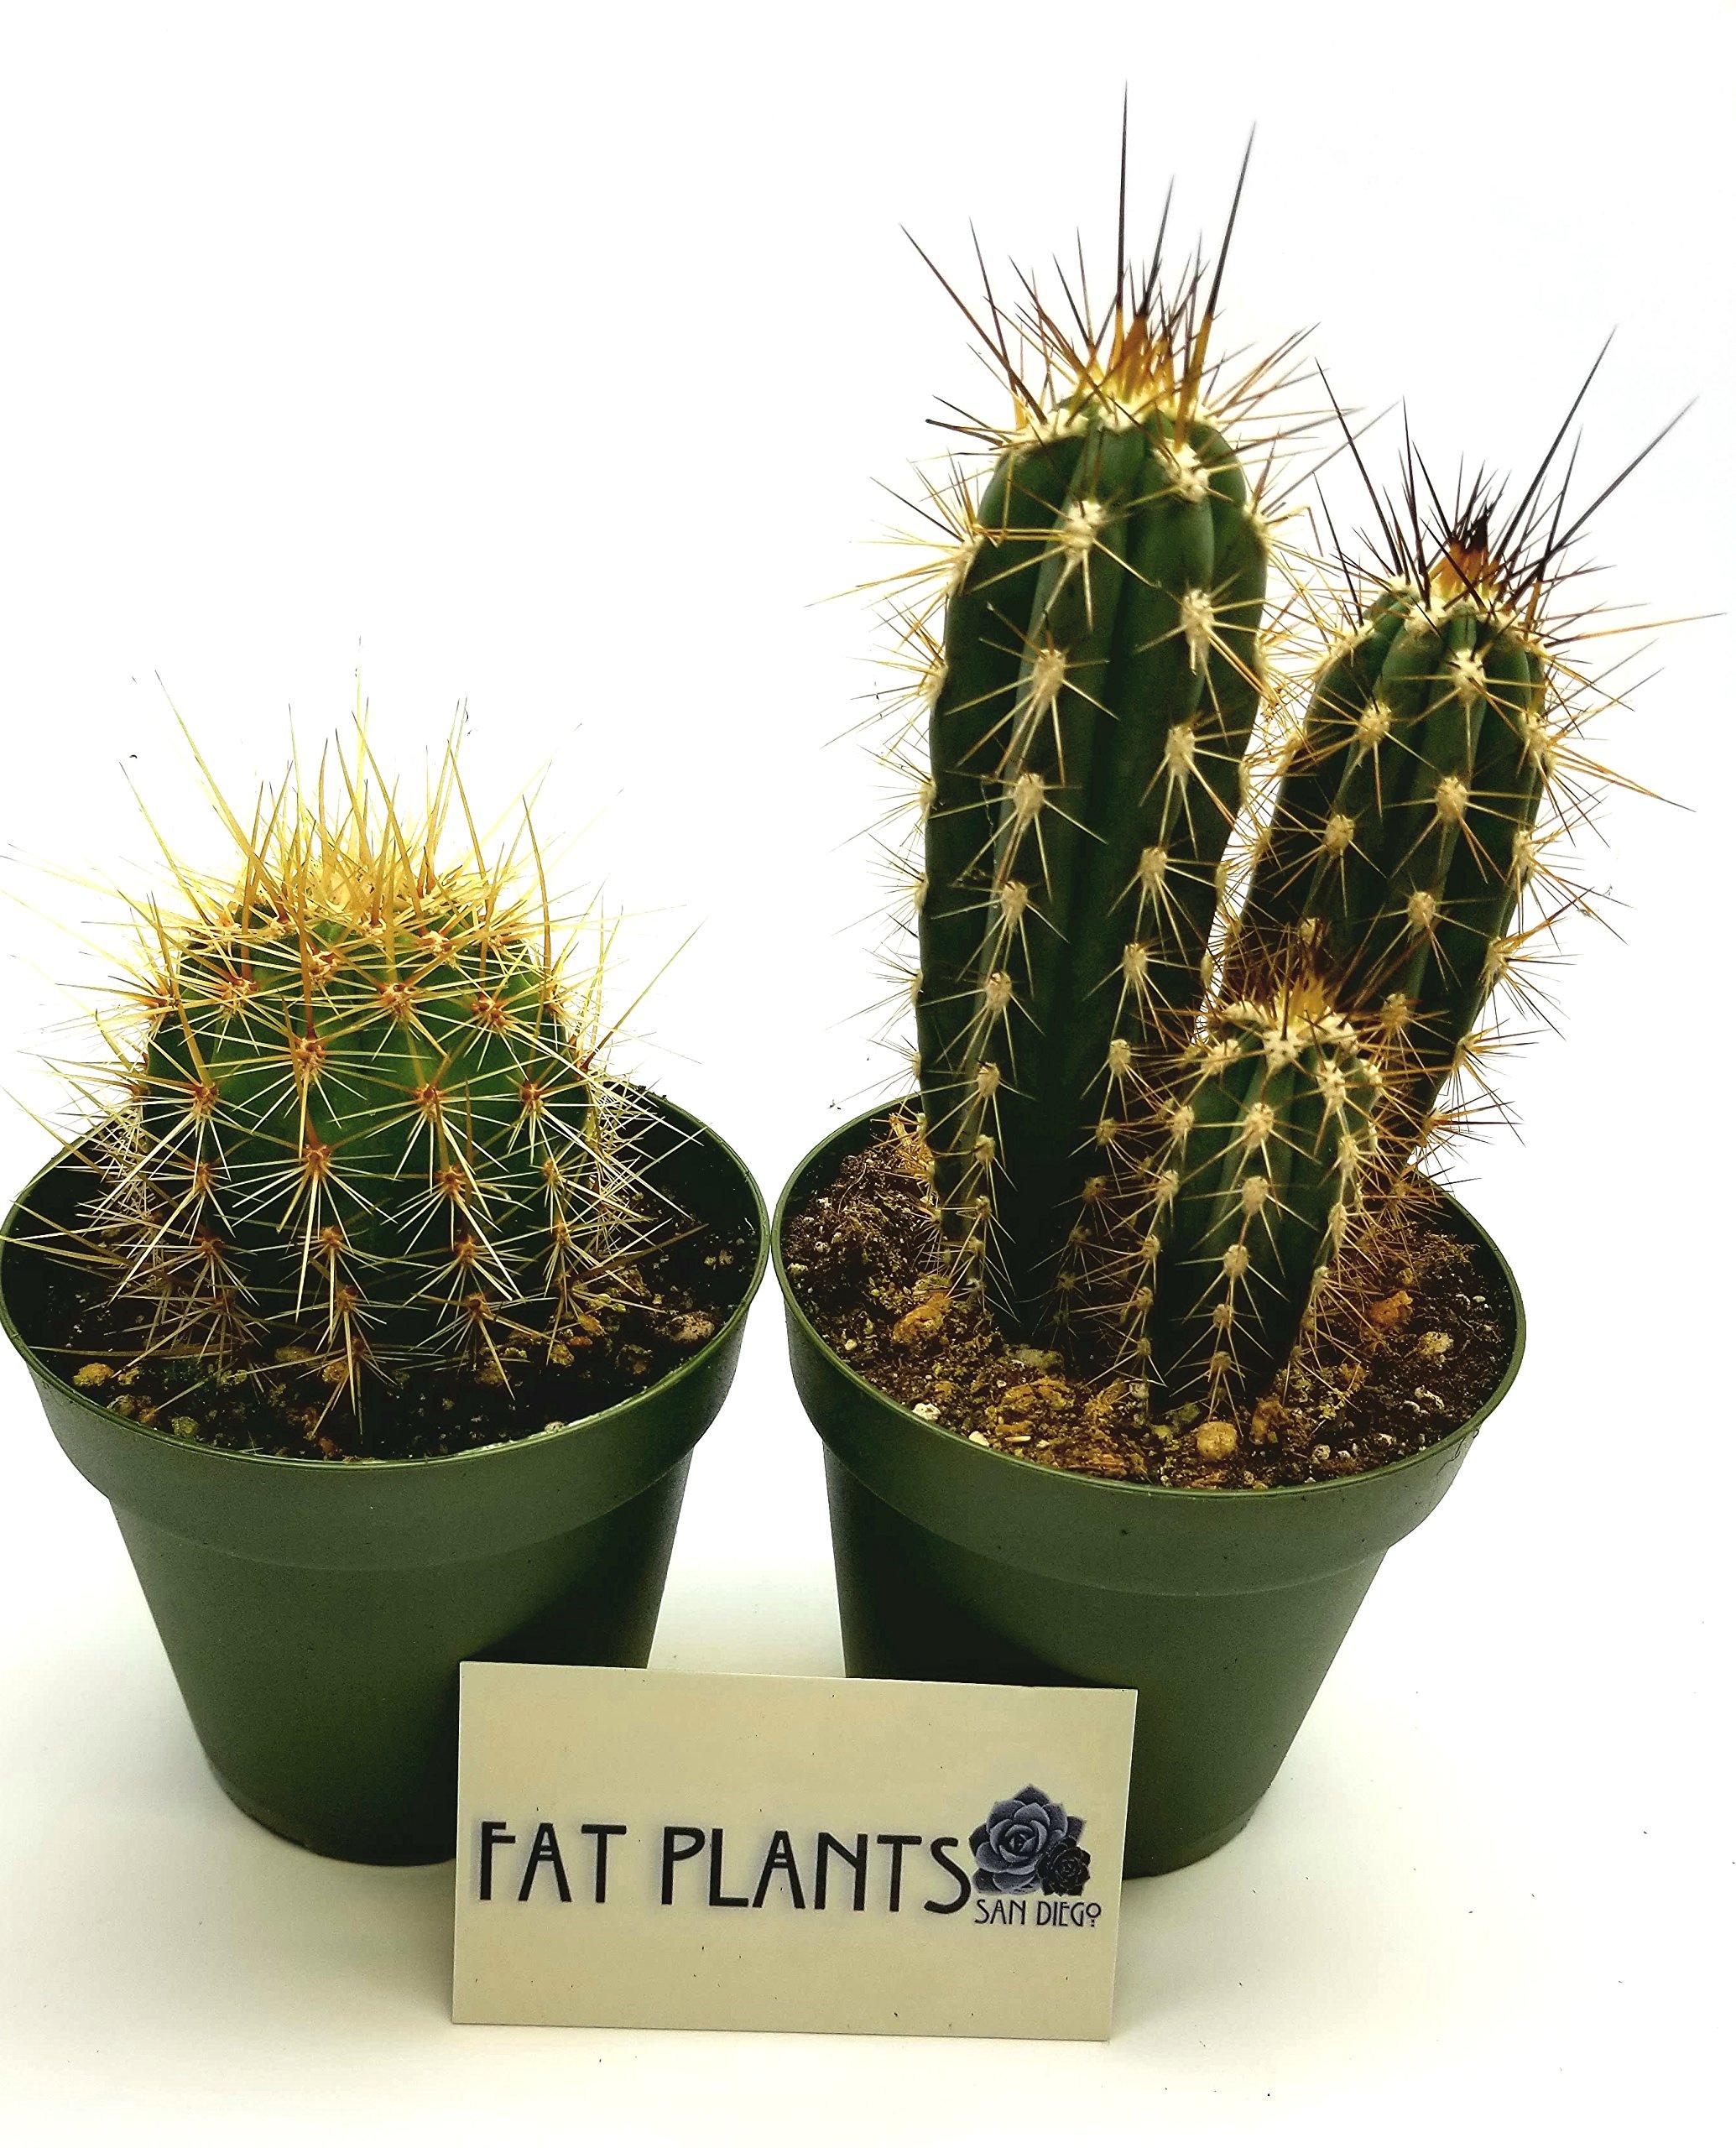 Fat Plants San Diego Large Cactus Plant(s) (2) by Fat Plants San Diego (Image #3)